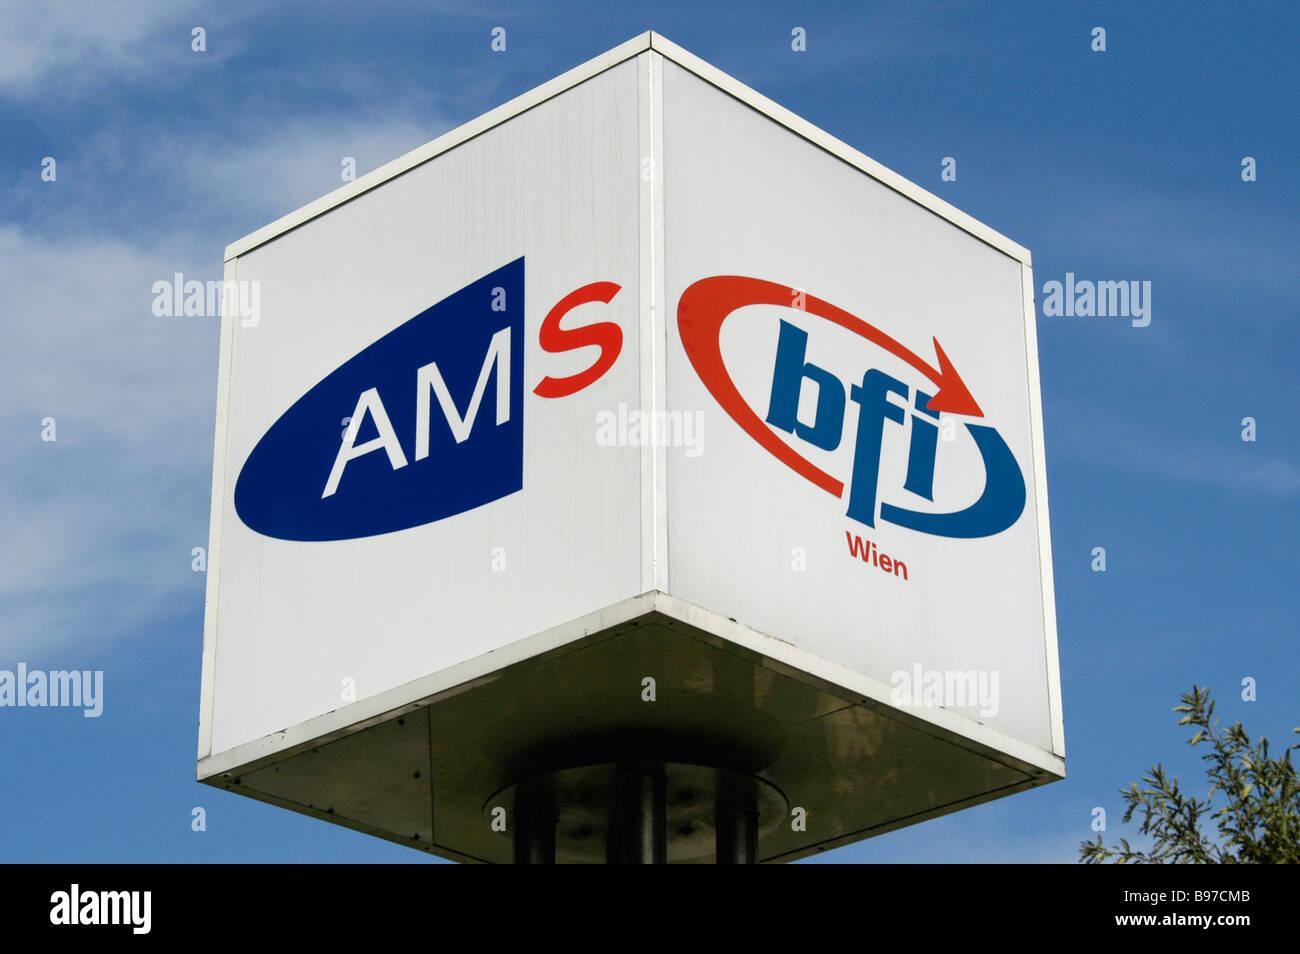 AMF and BFI Logo, - Stock Image